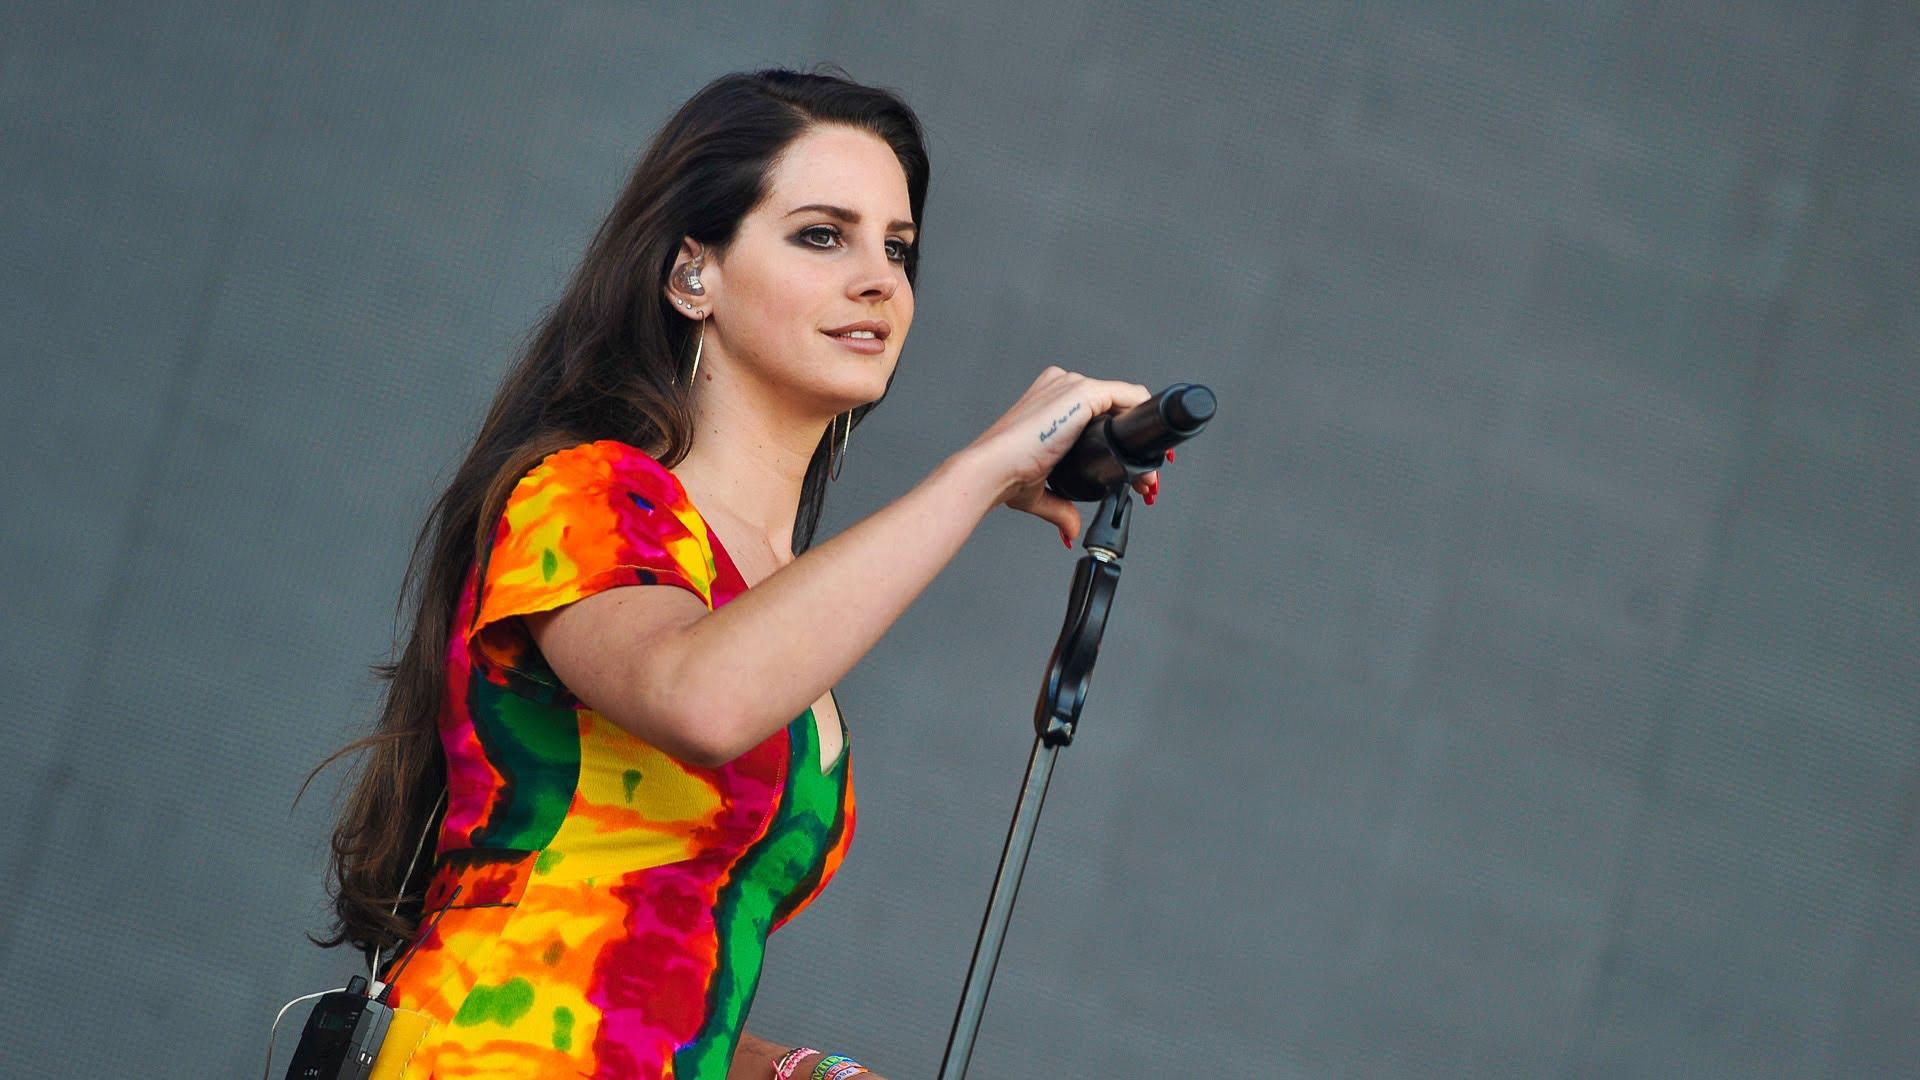 Lana Del Rey Sexy Wallpapers